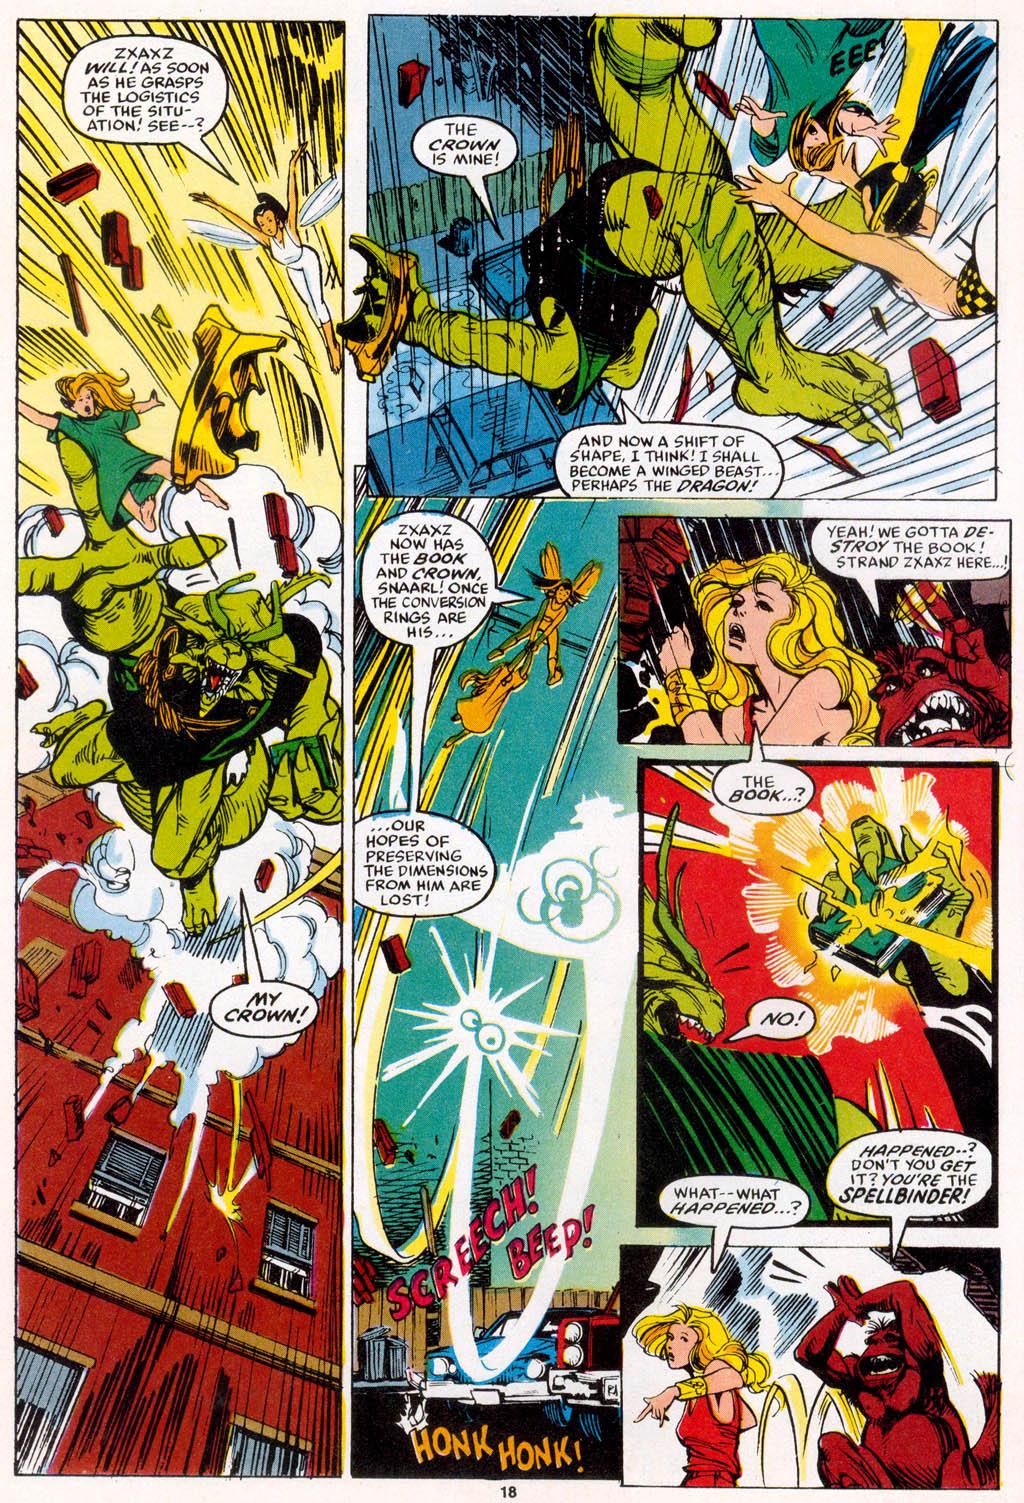 Read online Spellbound comic -  Issue #1 - 19